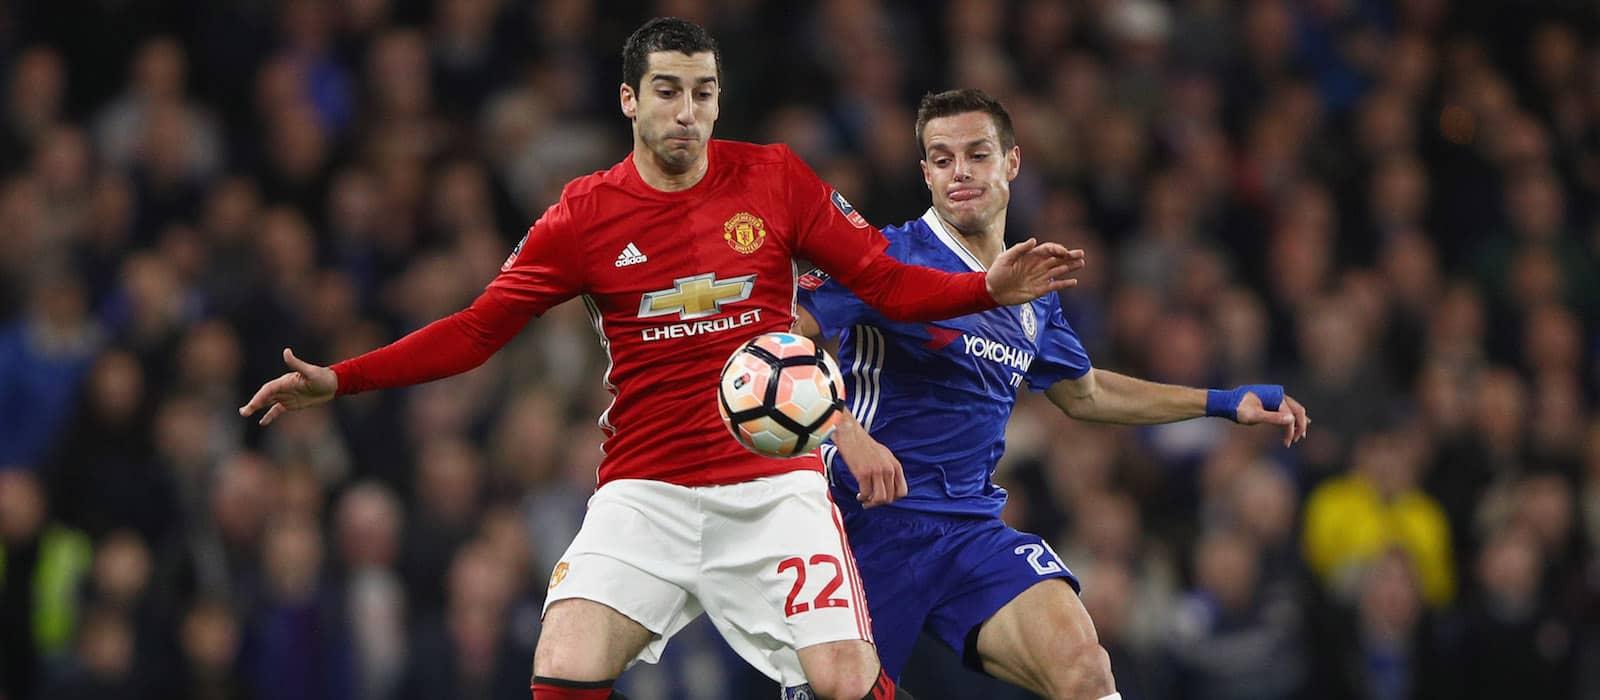 Man United fans delighted with Henrikh Mkhitaryan's performance against Sunderland